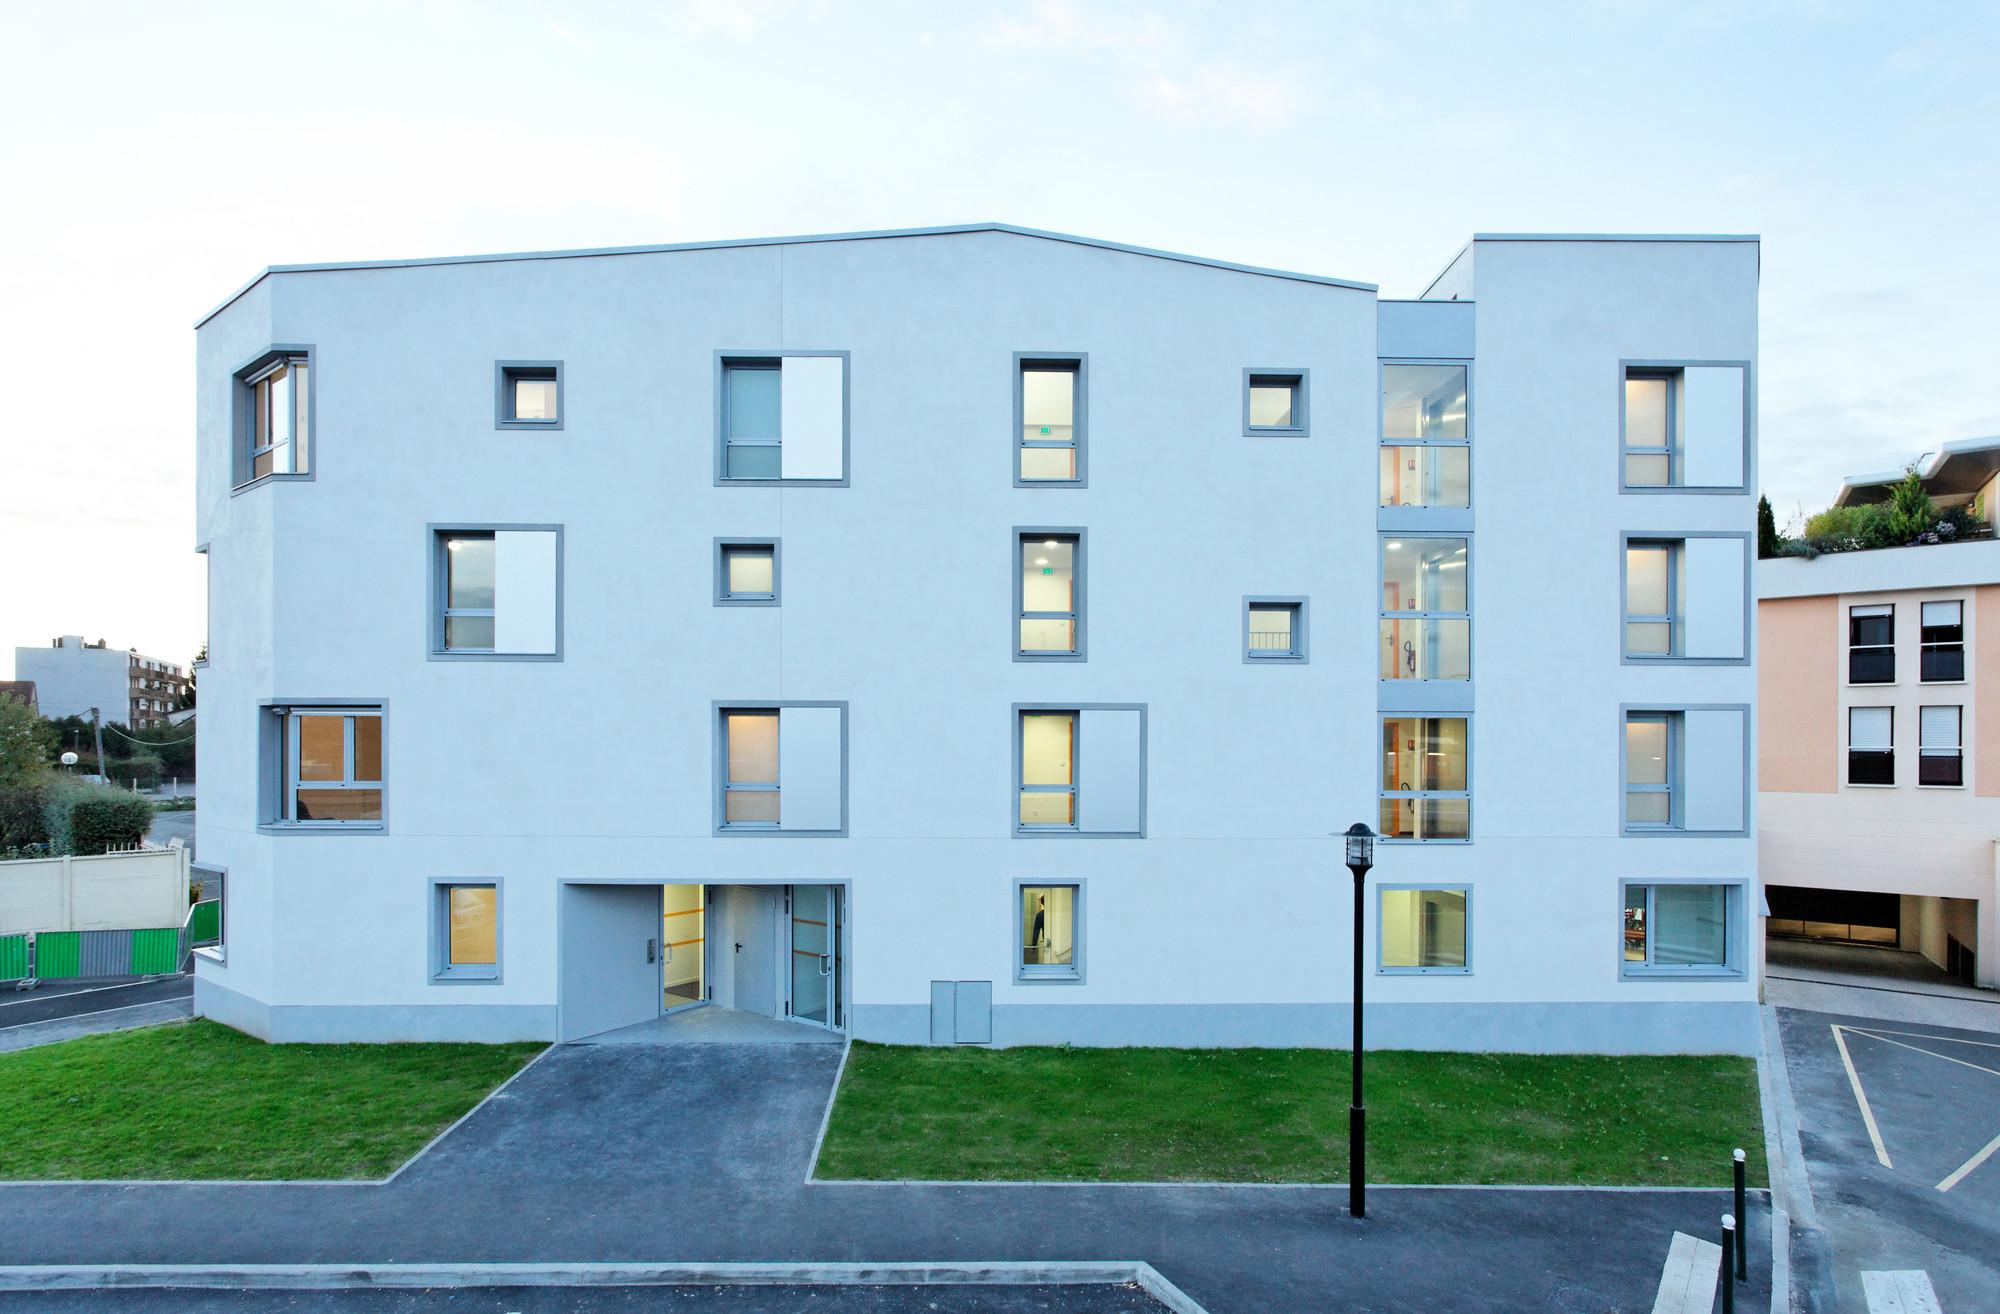 Transition Centre of 24 housing in Rambouillet / Benjamin Fleury, © David Boureau